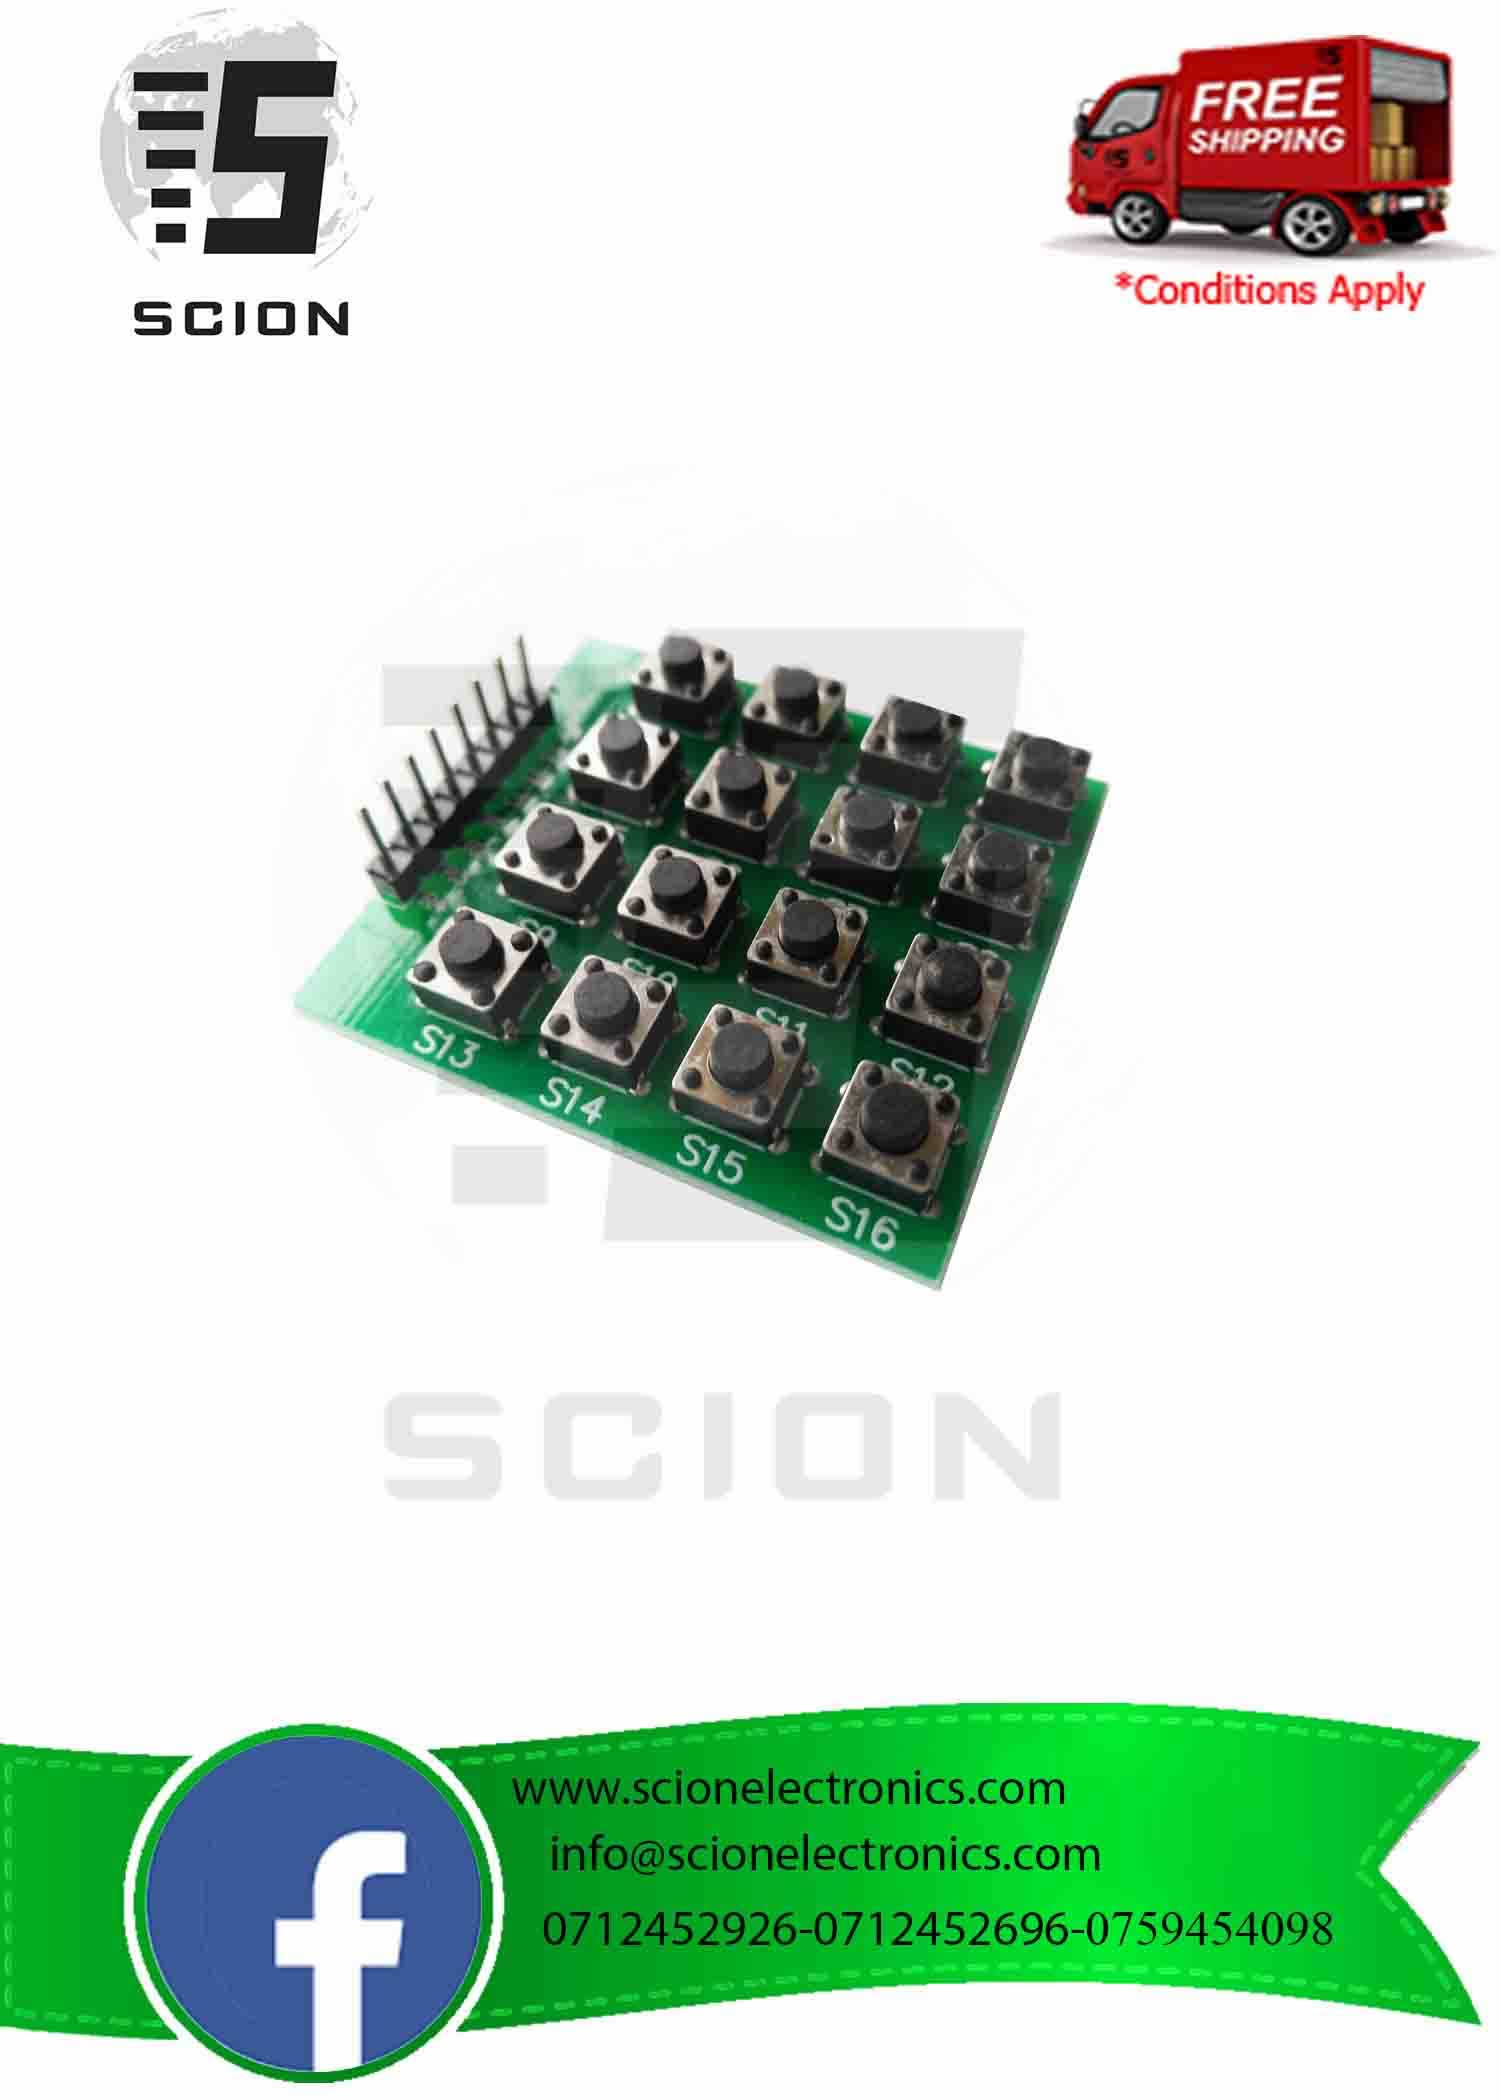 f88b4360ca5 4×4 Matrix 16 Keypad Keyboard Module 16 Button MCU for Arduino ...